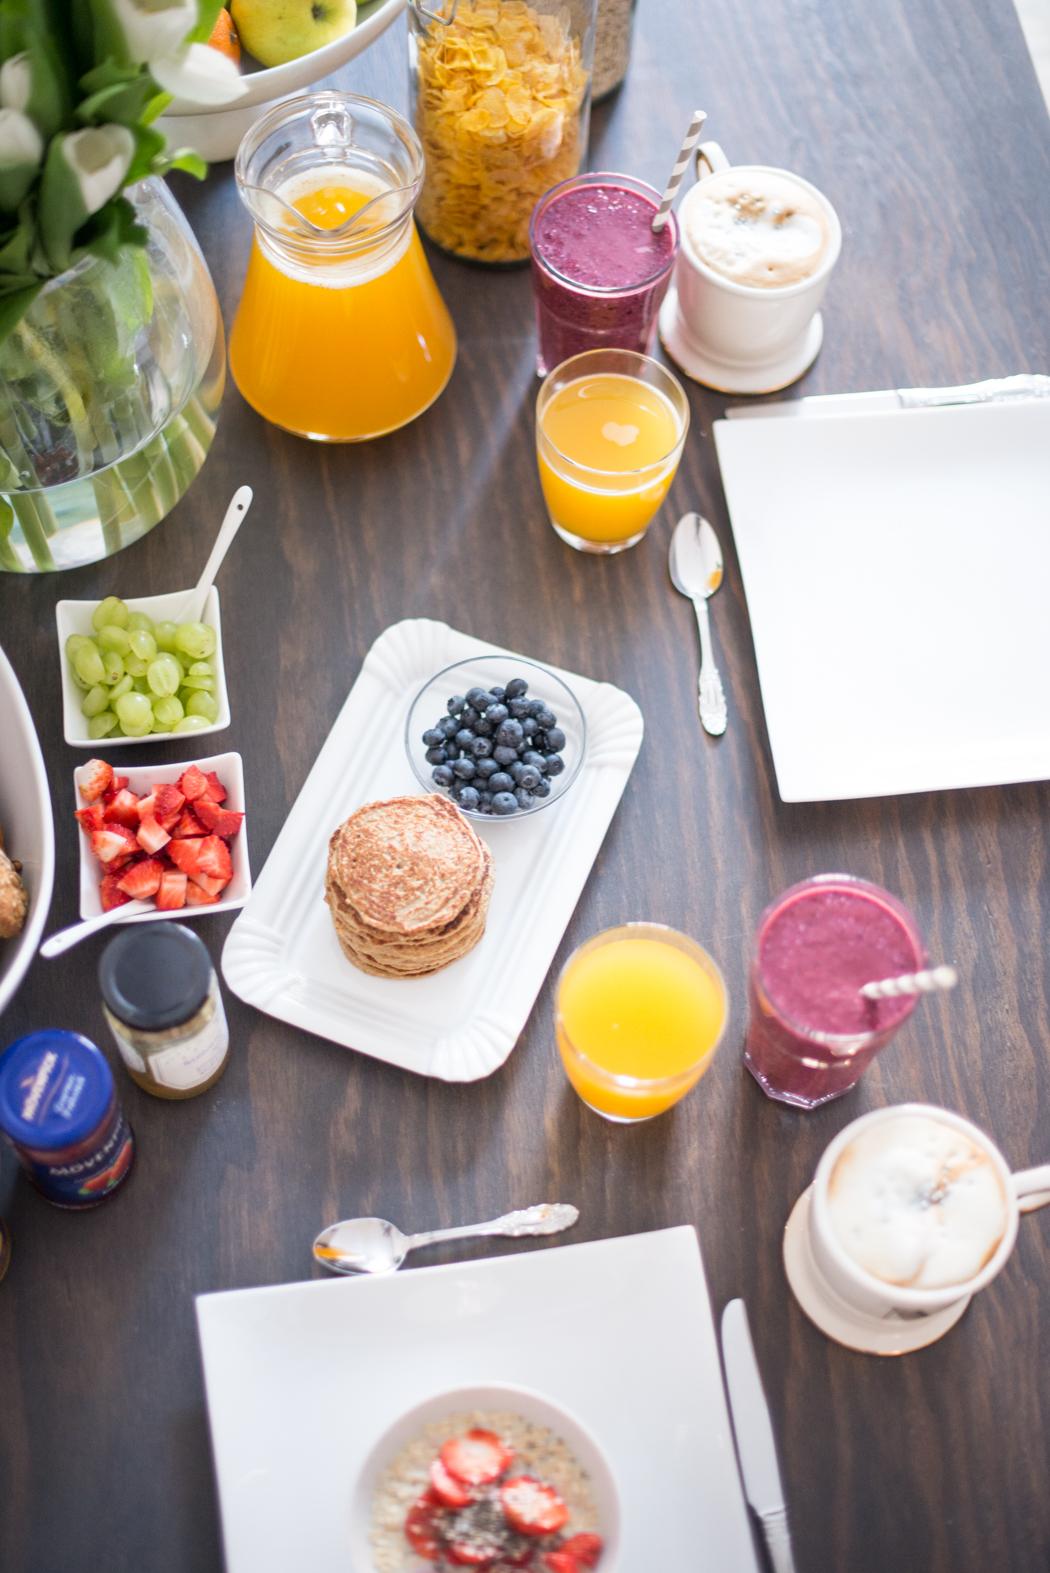 Foodblogger-München-Foodblog-Deutschland-Lindarella-veganes-Frühstück-Frühstücksinspiration-vegane-Pancakes-Clean-Eating-6